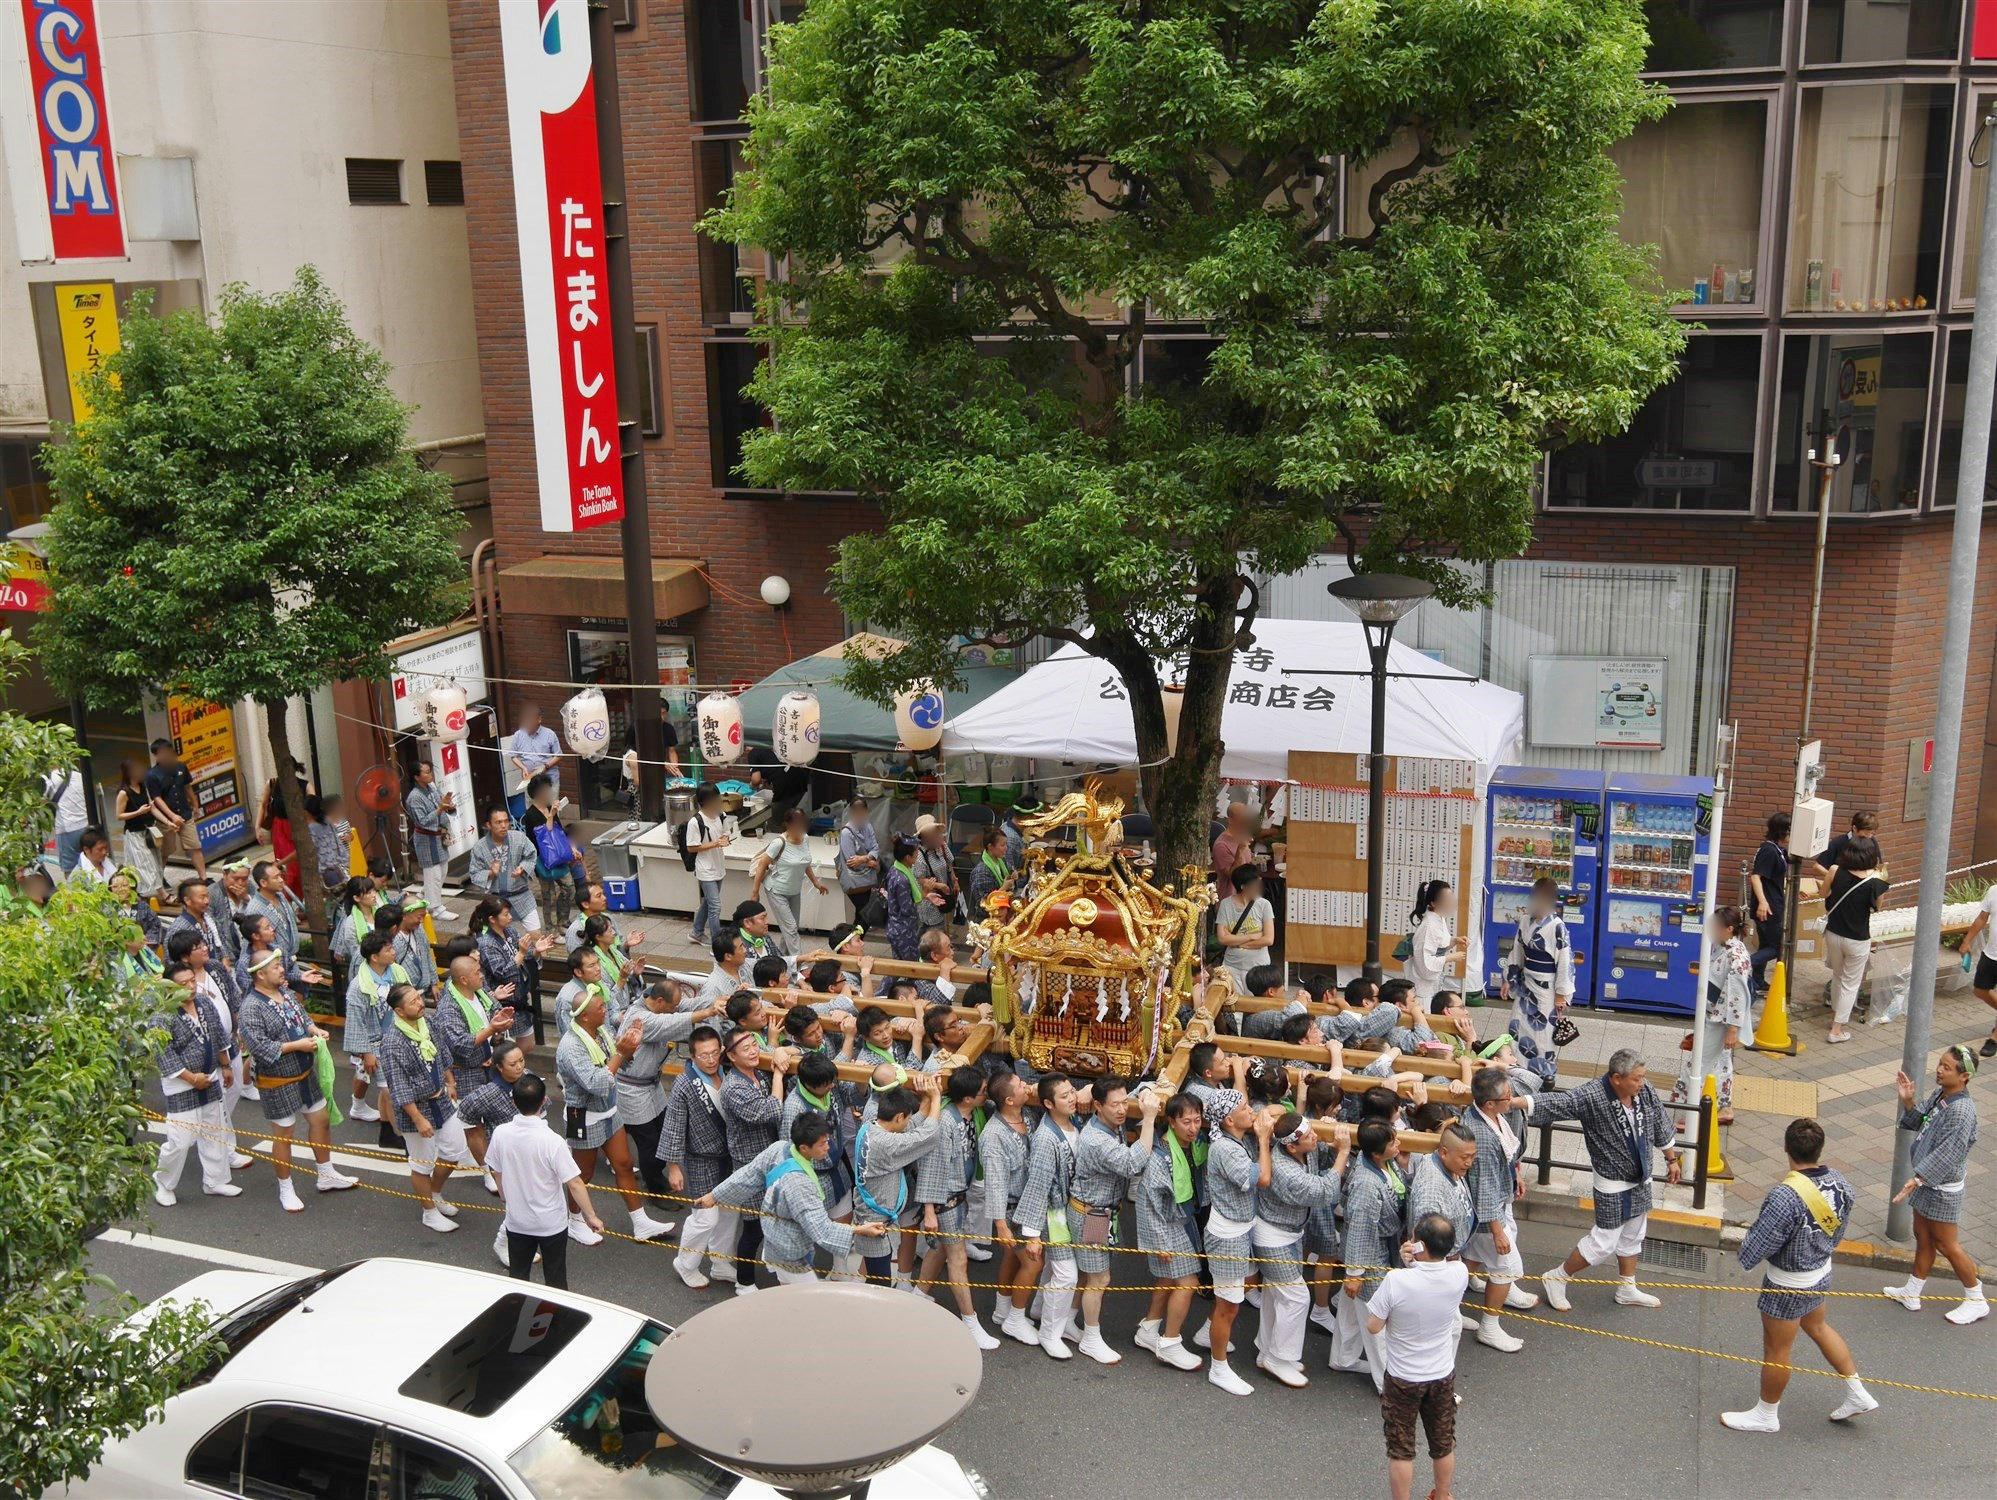 A20180908-吉祥寺秋まつり (1).jpg